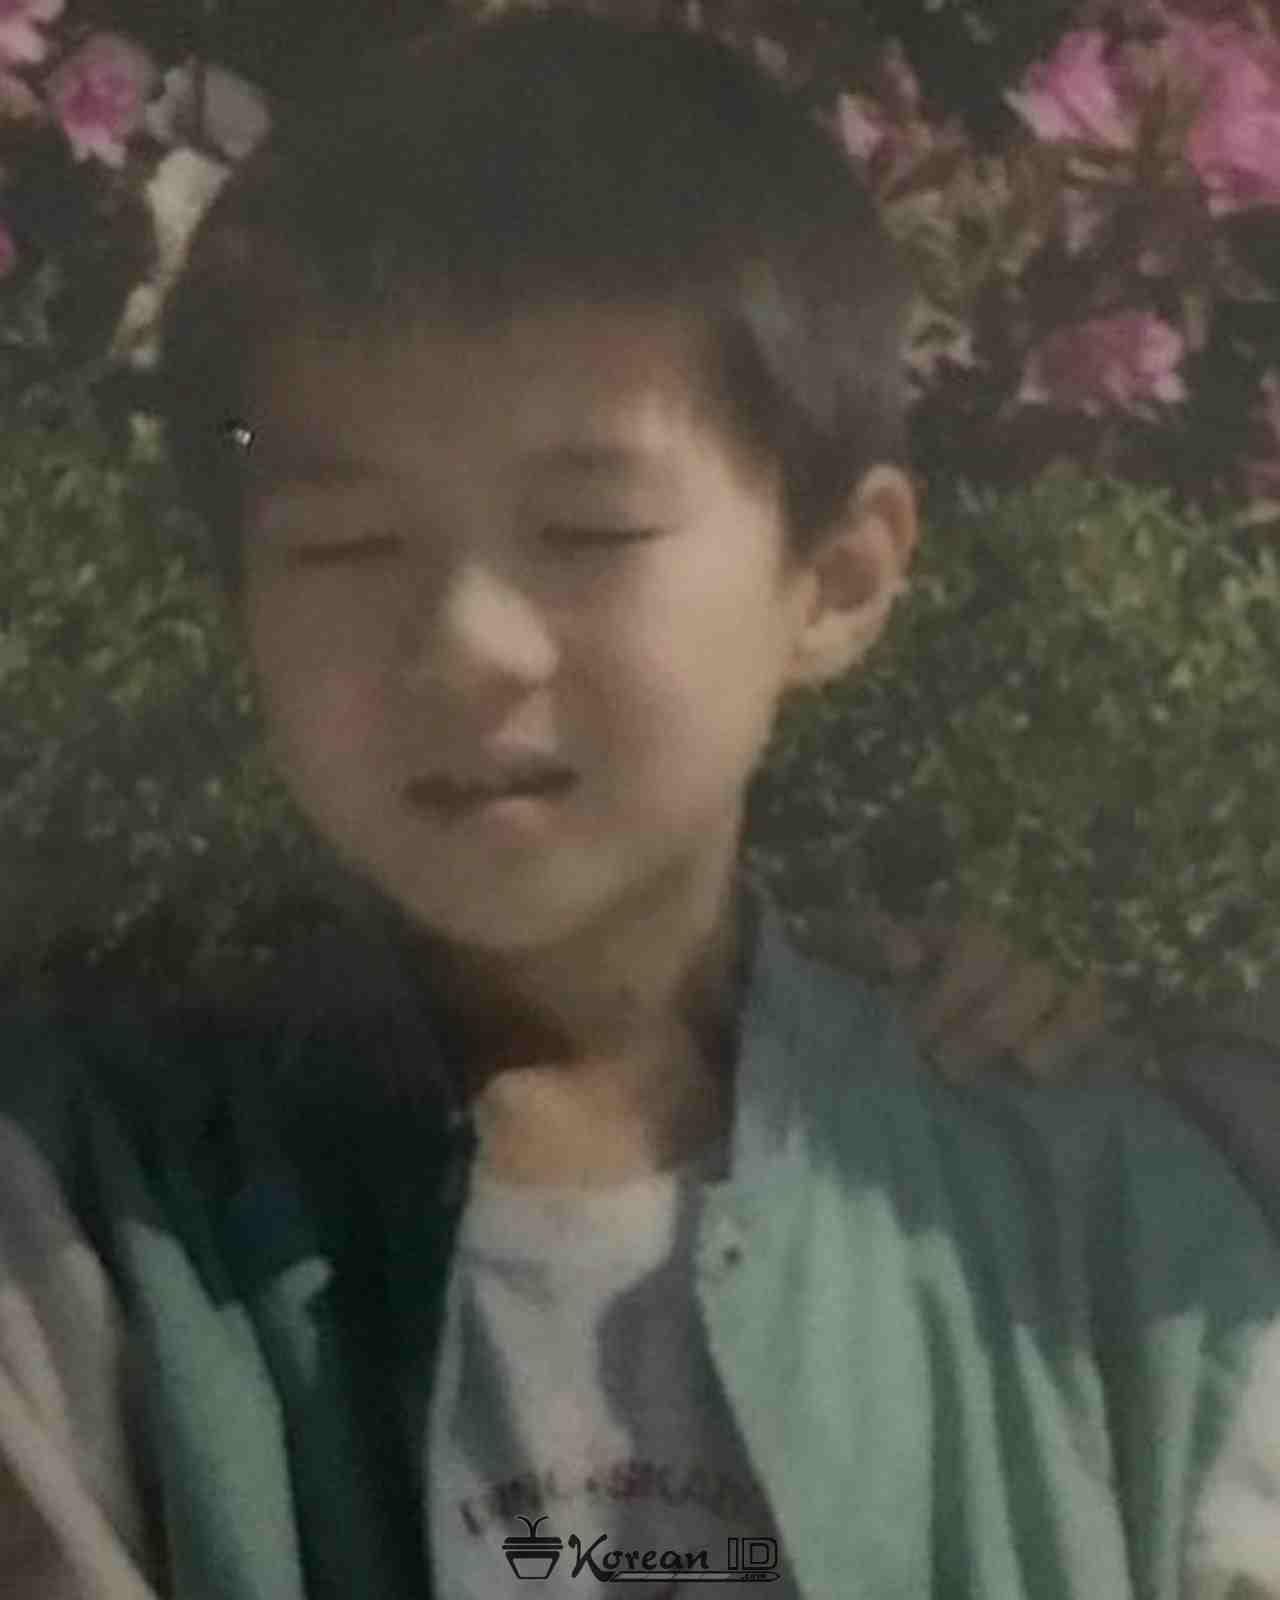 Biodata Fakta Dan Foto Sehun Exo Ikat Rambut Anak Ariees Waktu Masih Kecil